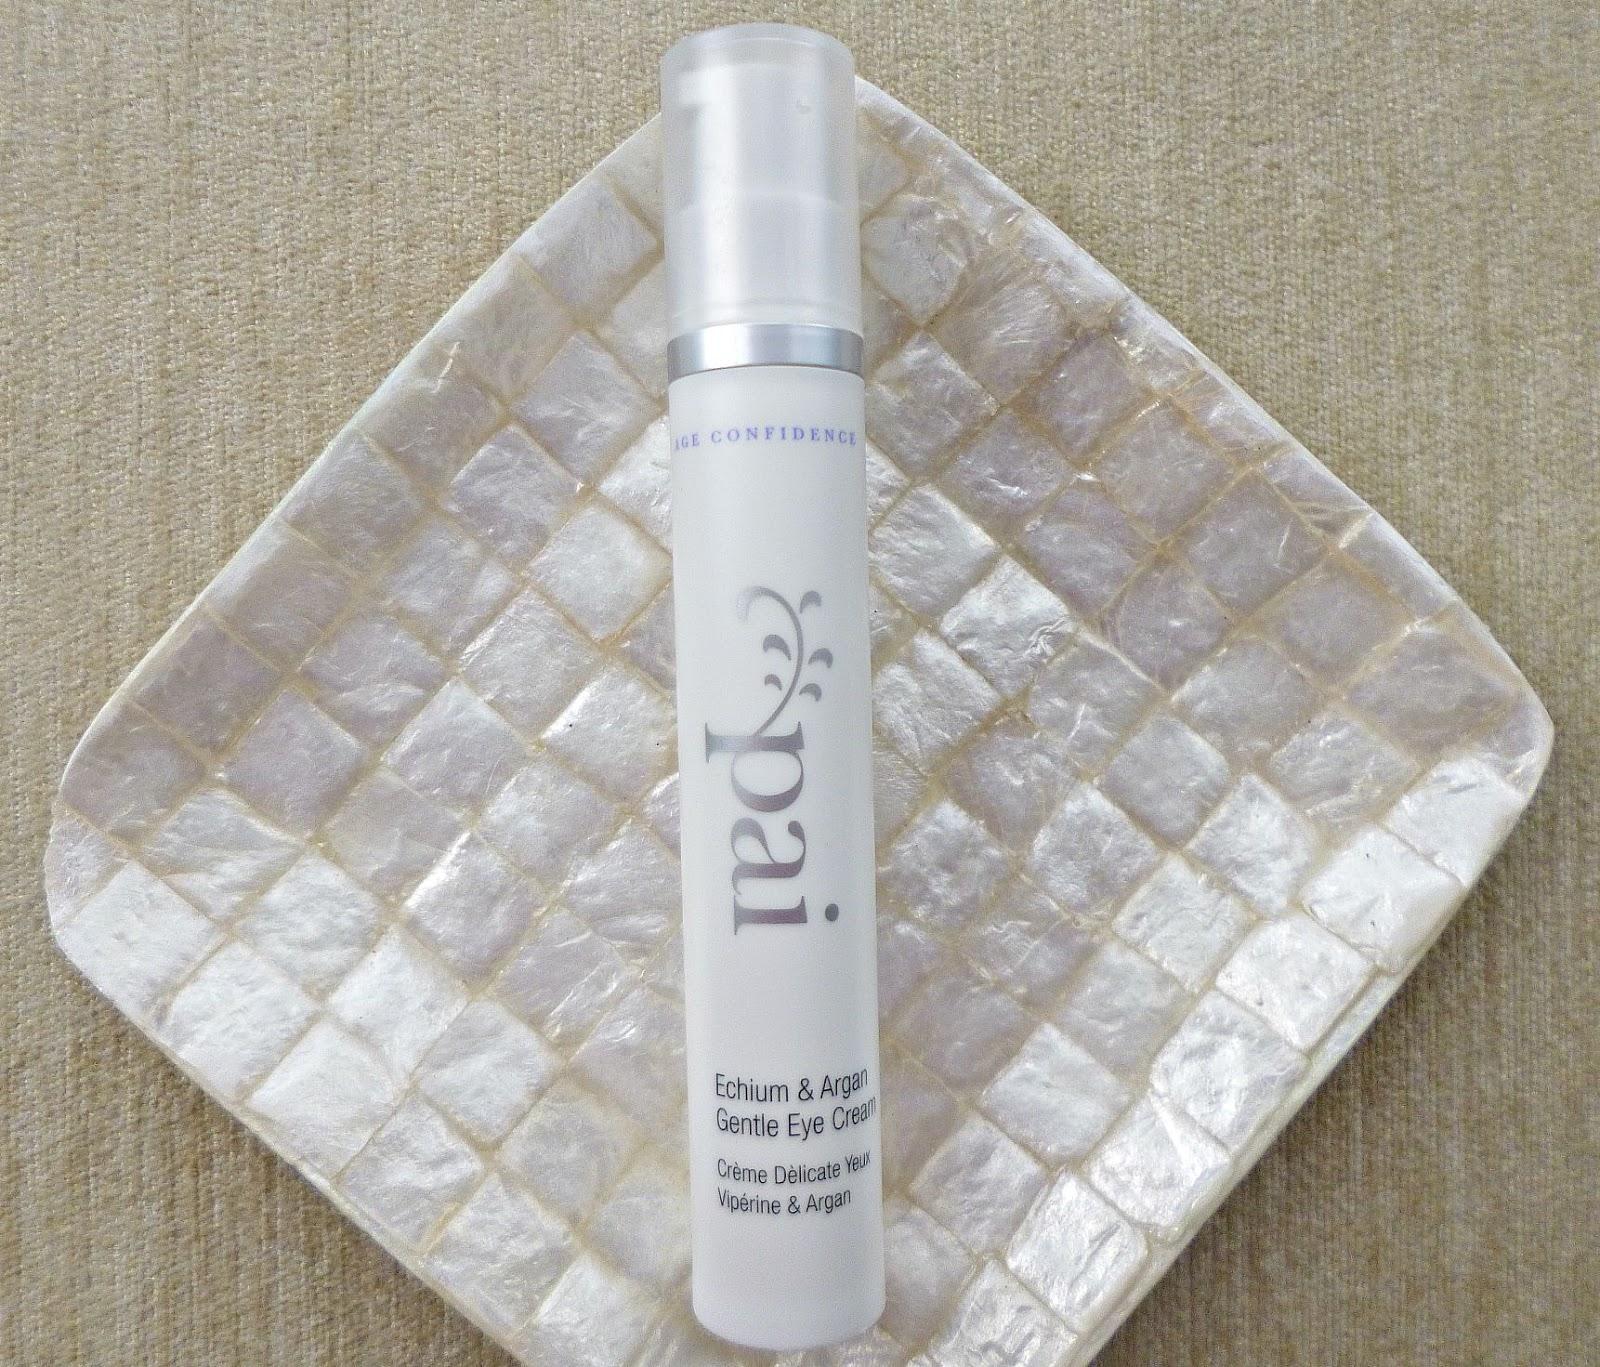 Pai Echium and Argan gentle Eye cream